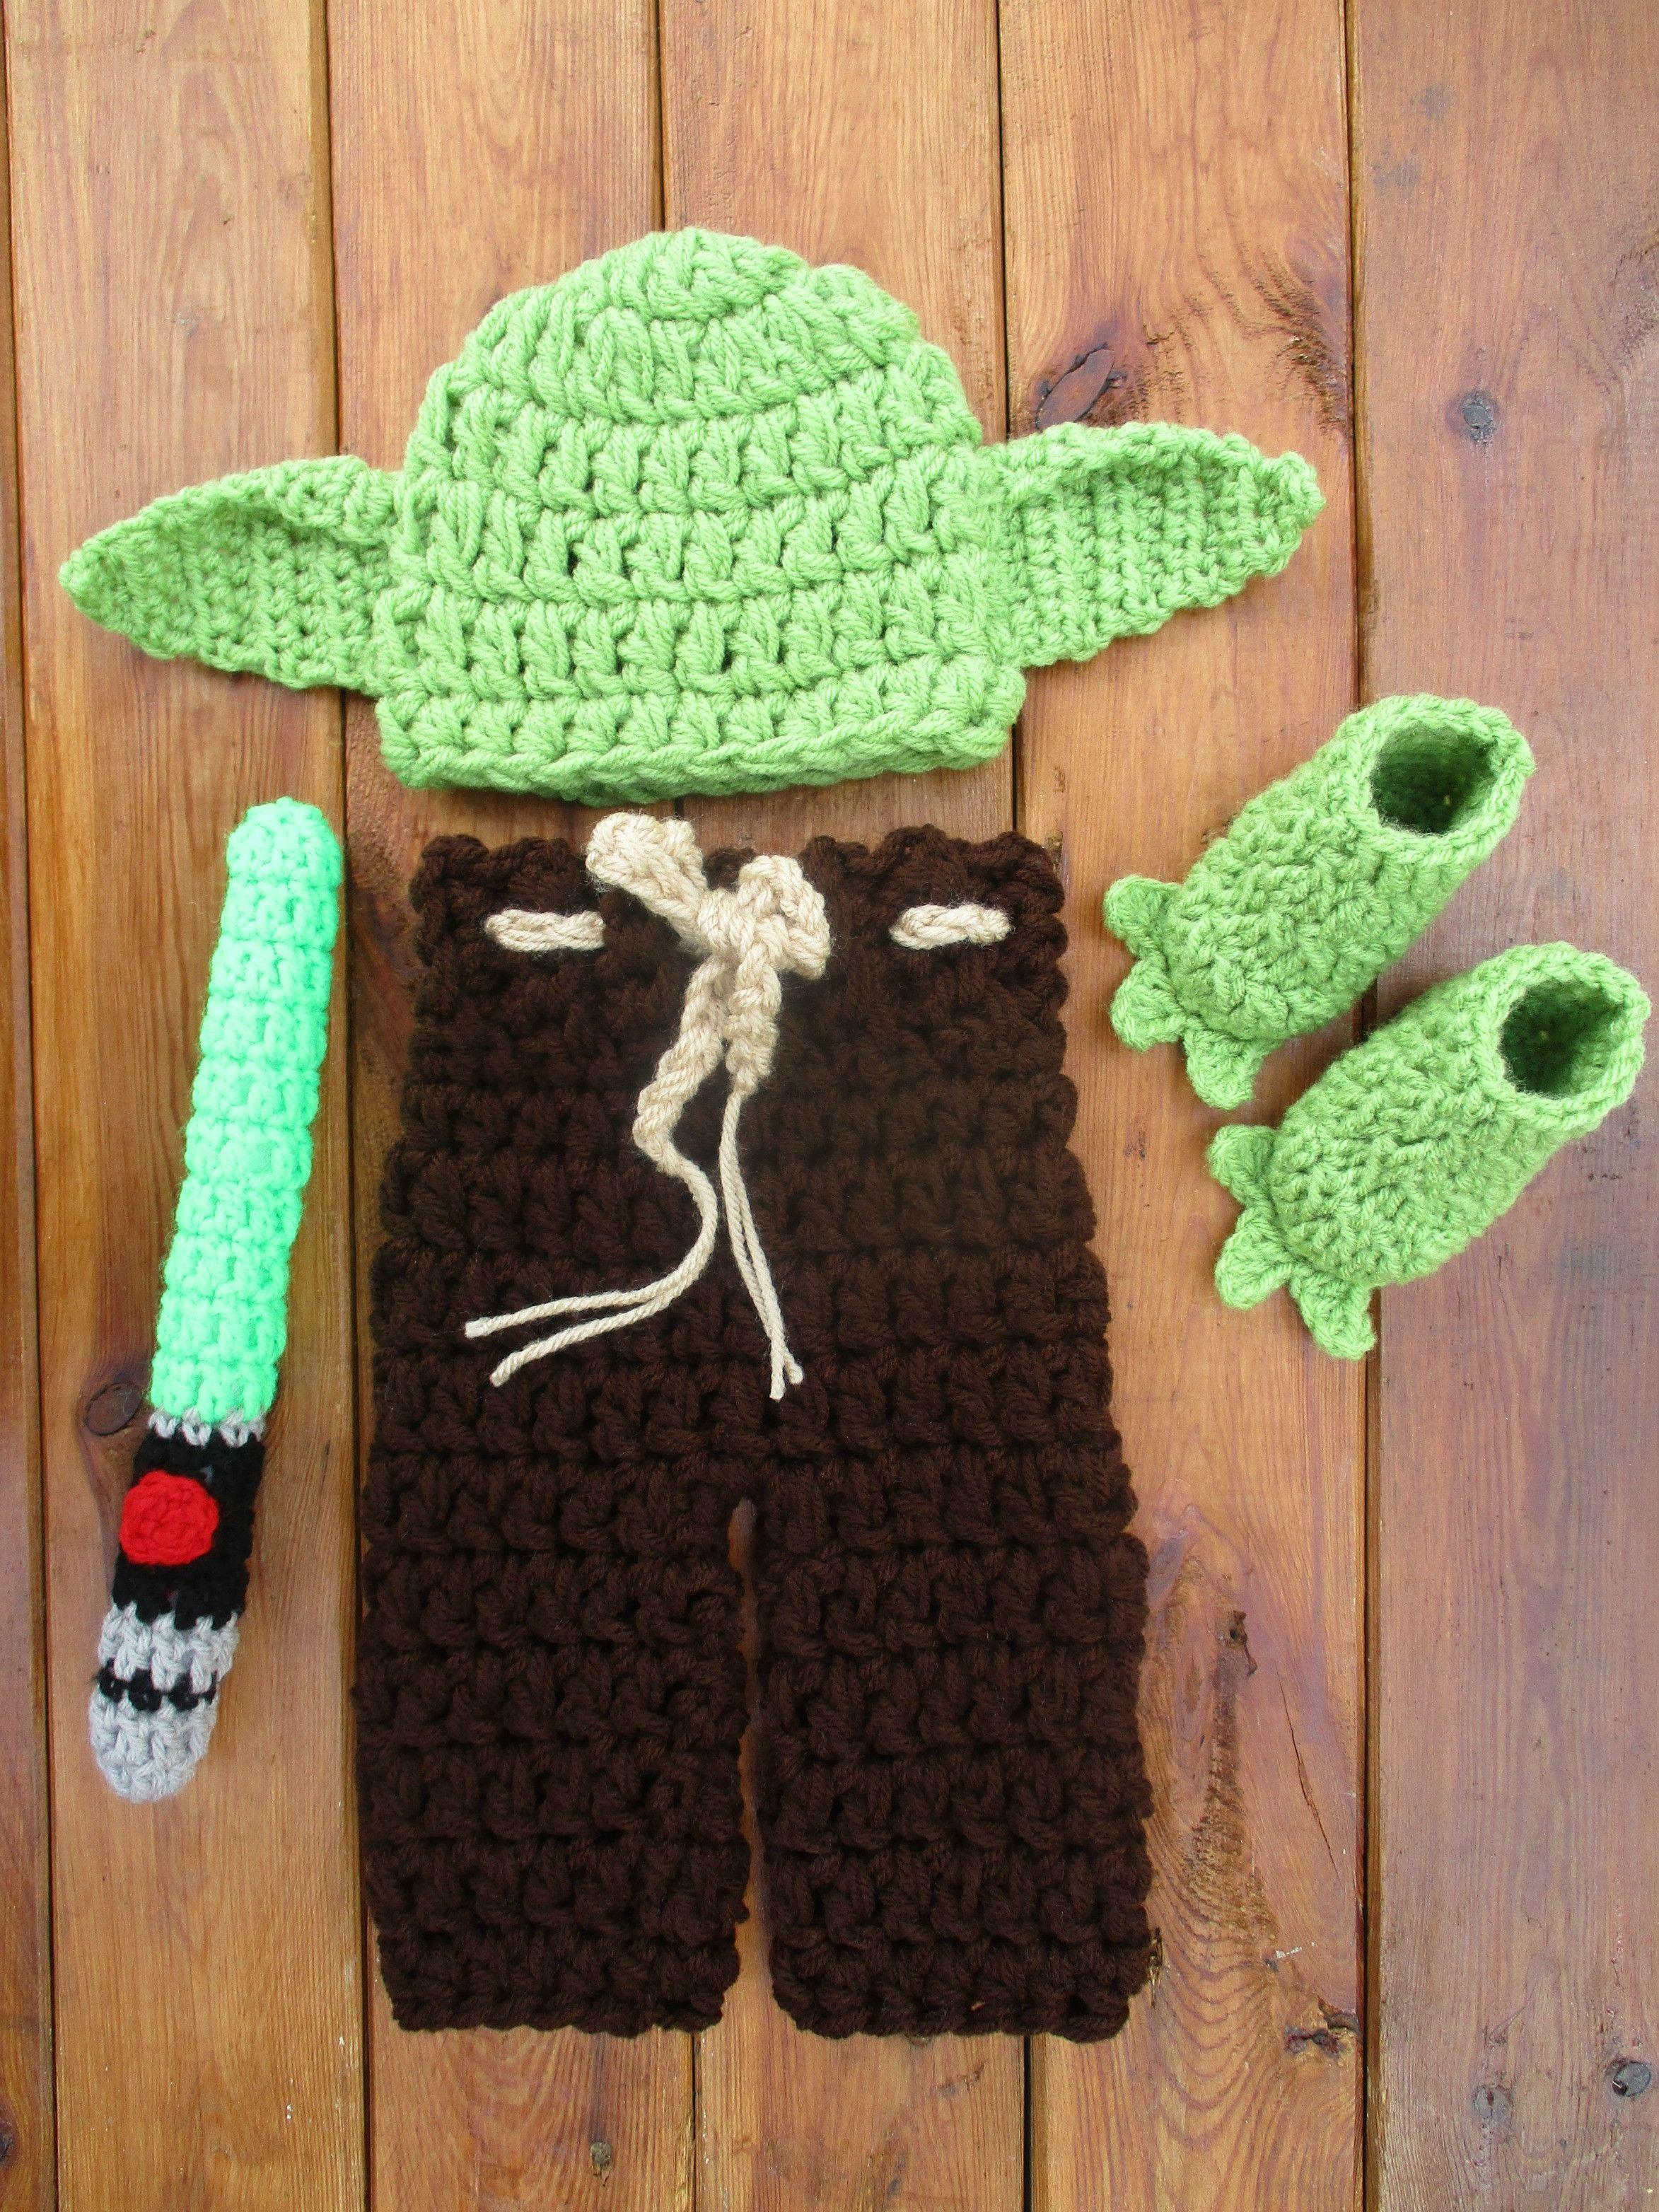 Star Wars Baby Yoda Crochet Costume Newborn Photo Props Disney